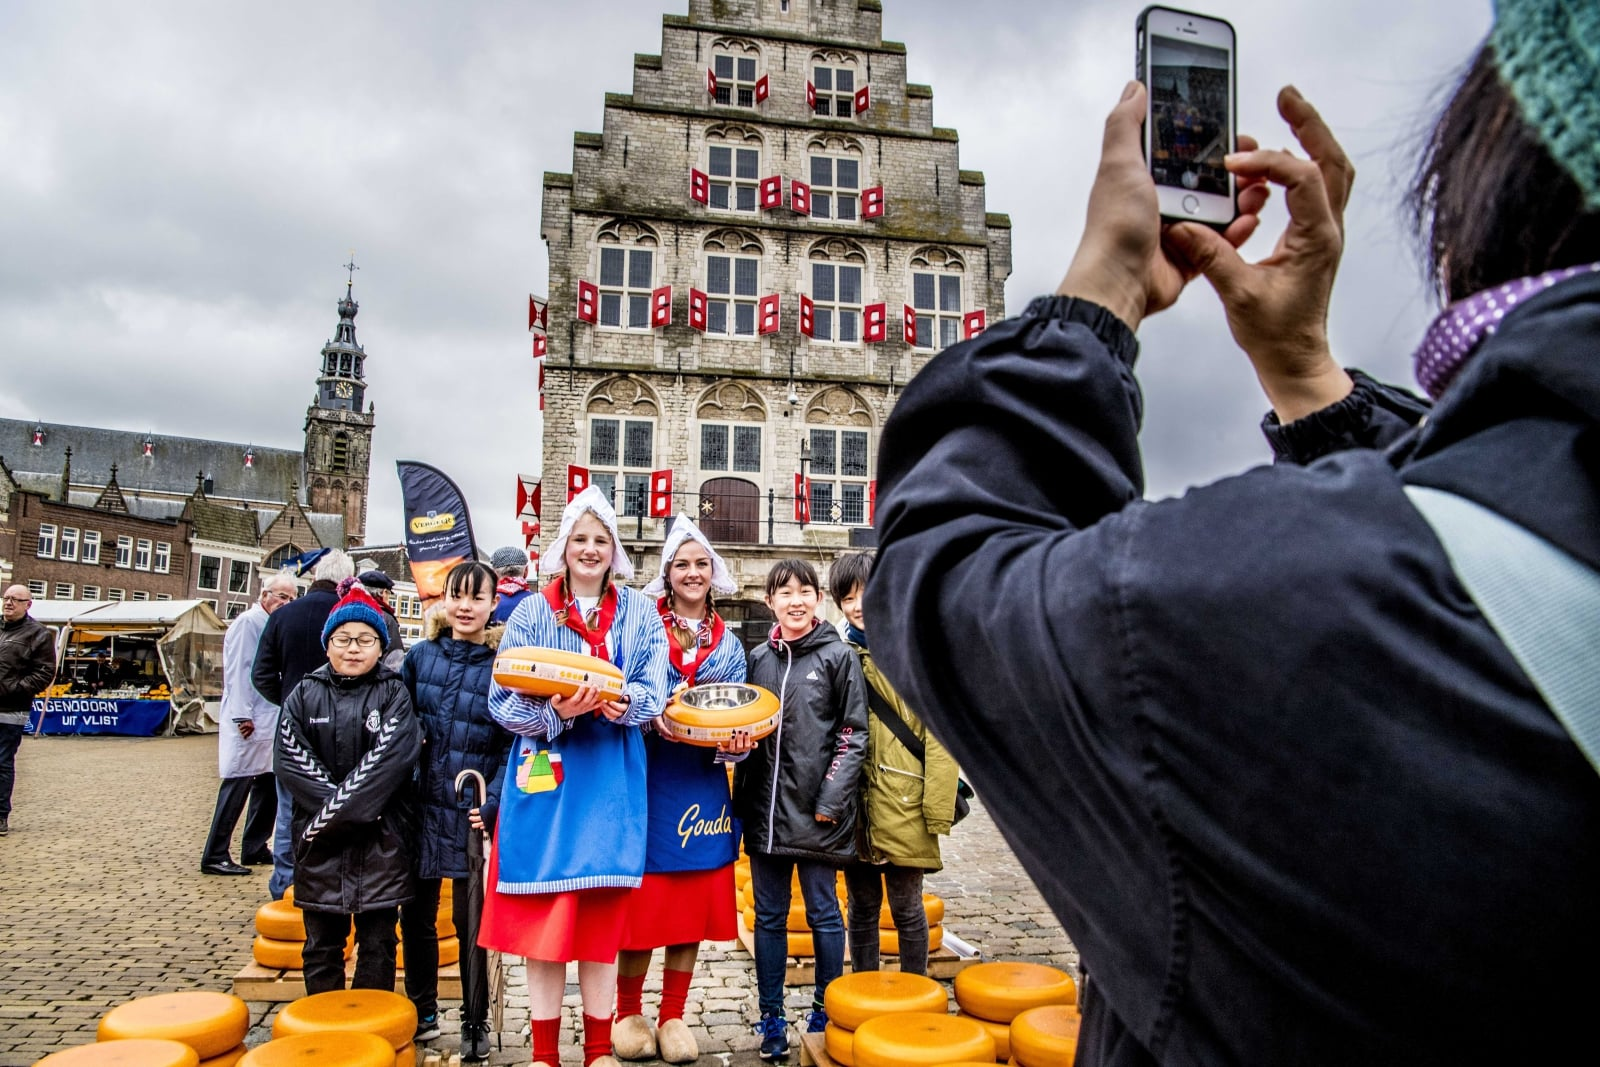 Targ serowy w Holandii EPA/ROBIN UTRECHT